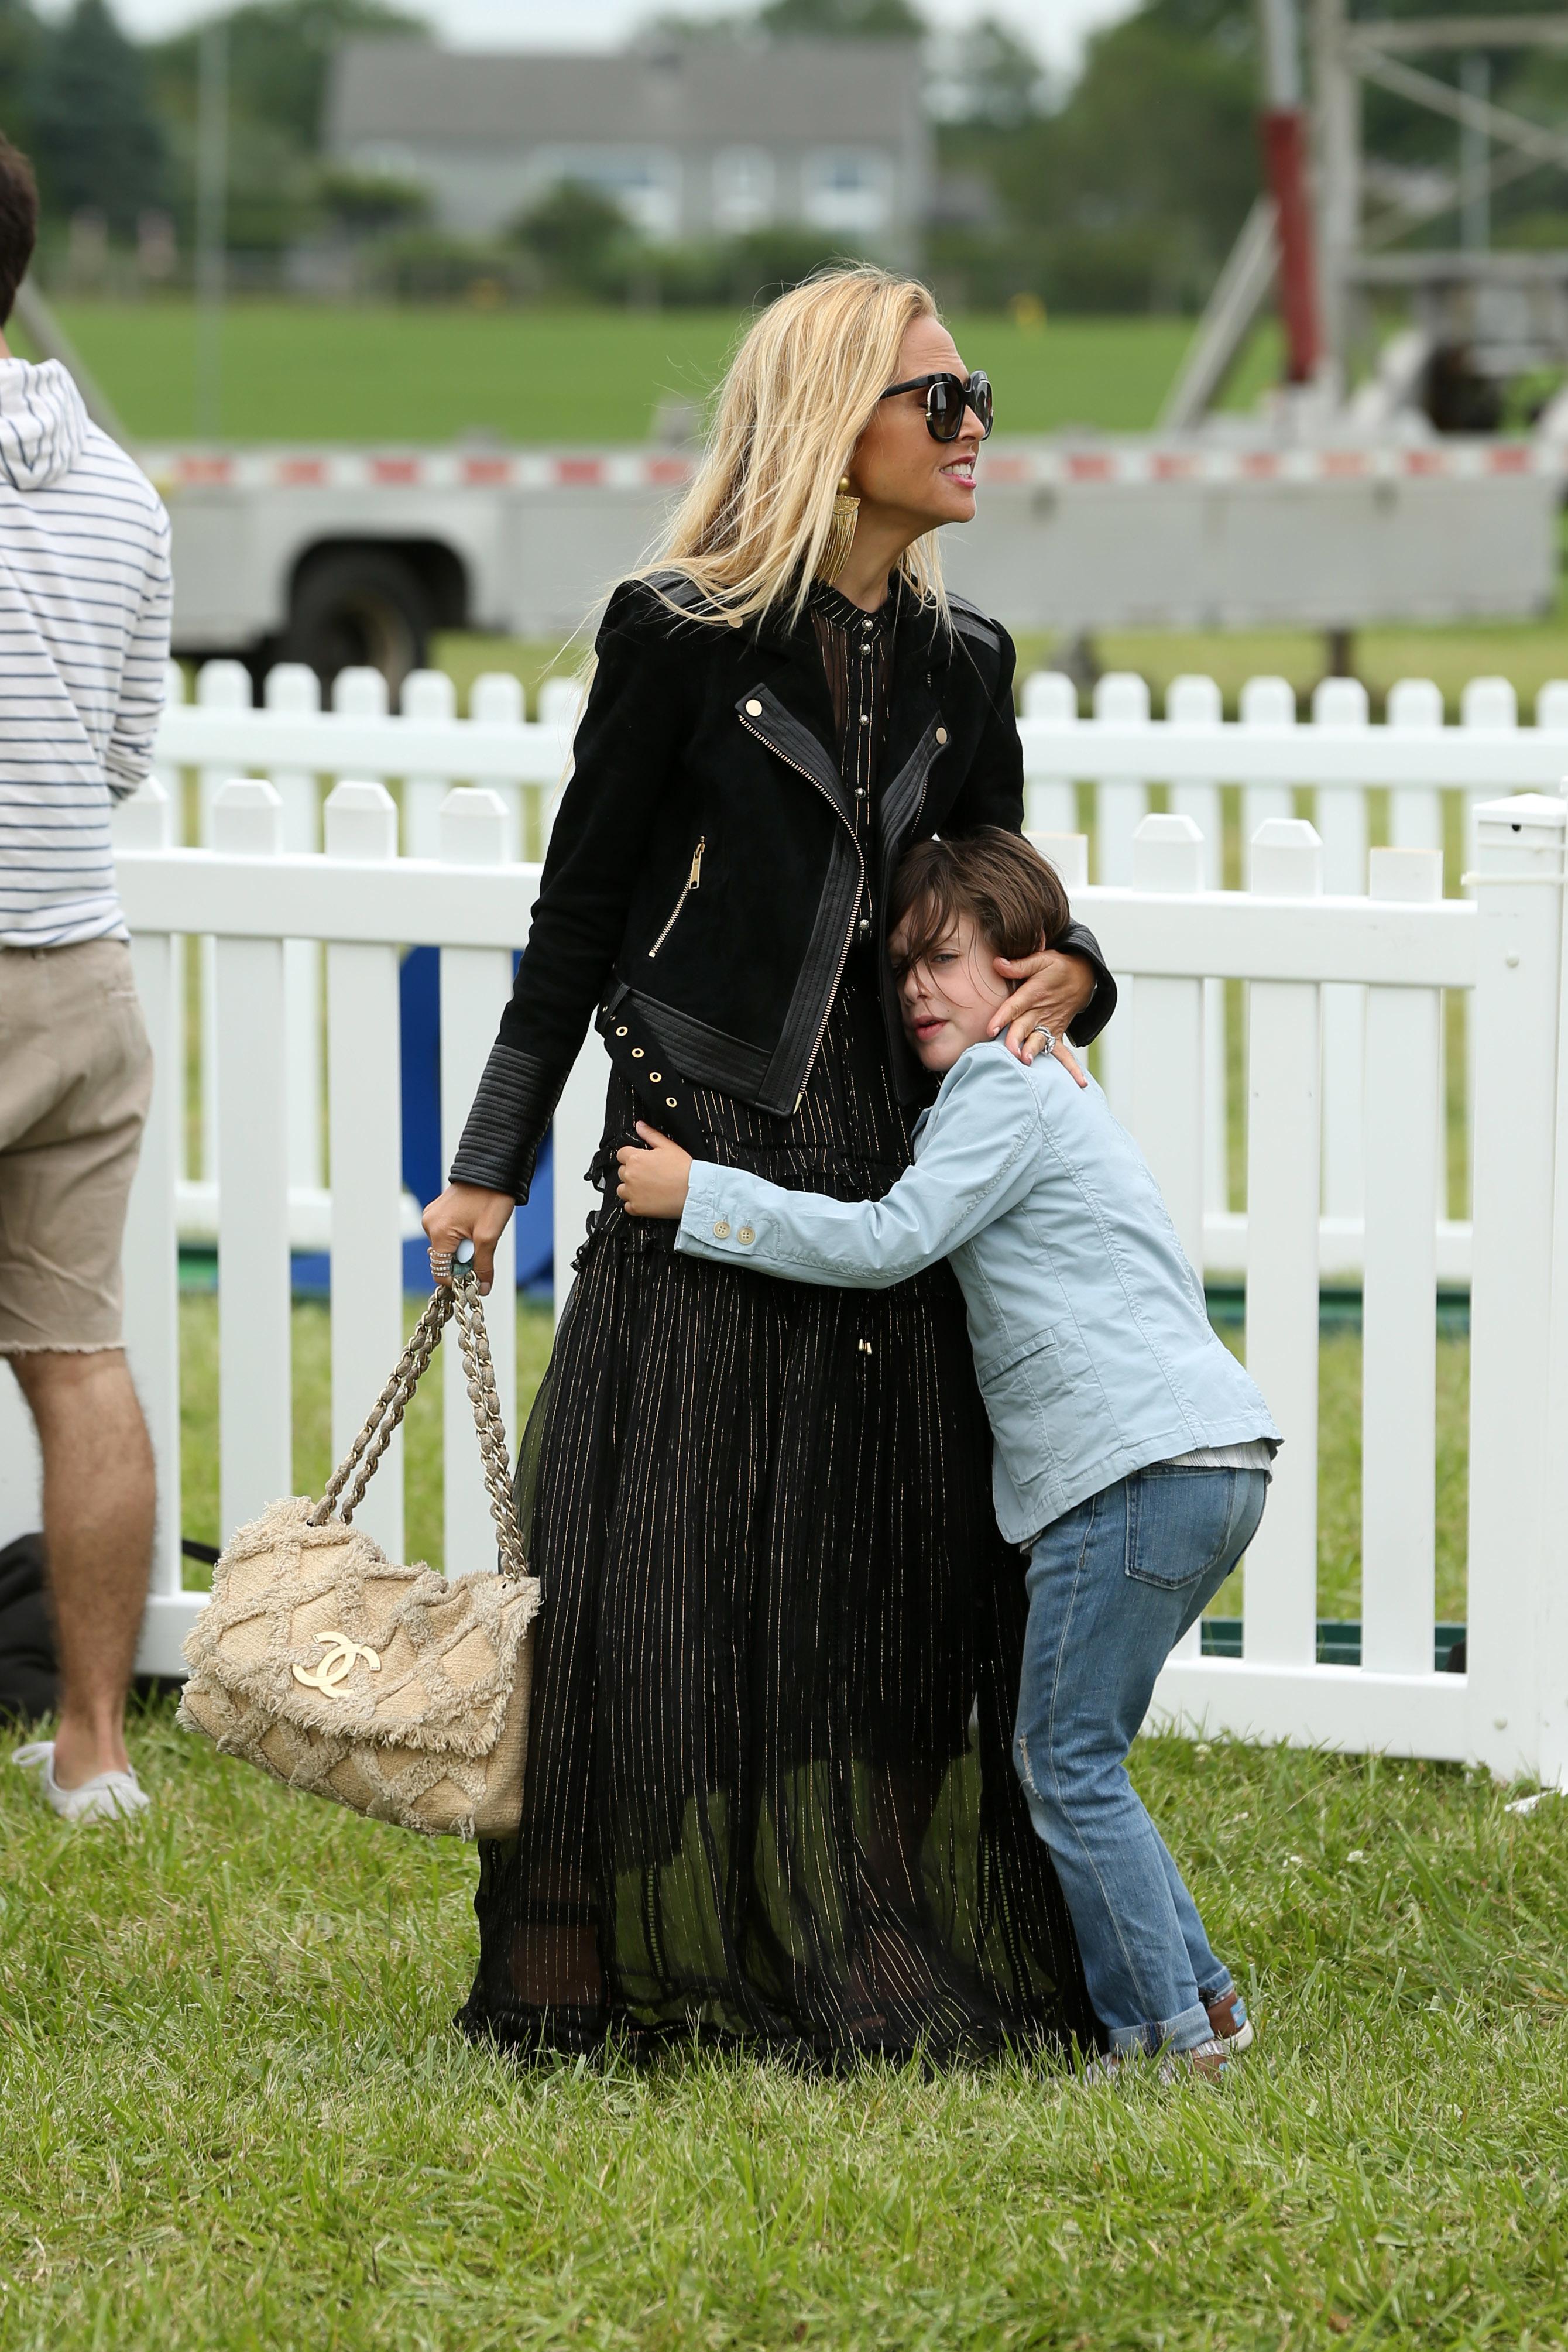 Rachel Zoe got a sweet hug from son Skyler Berman while at an event in Bridgehampton, New York, on July 29, 2017.